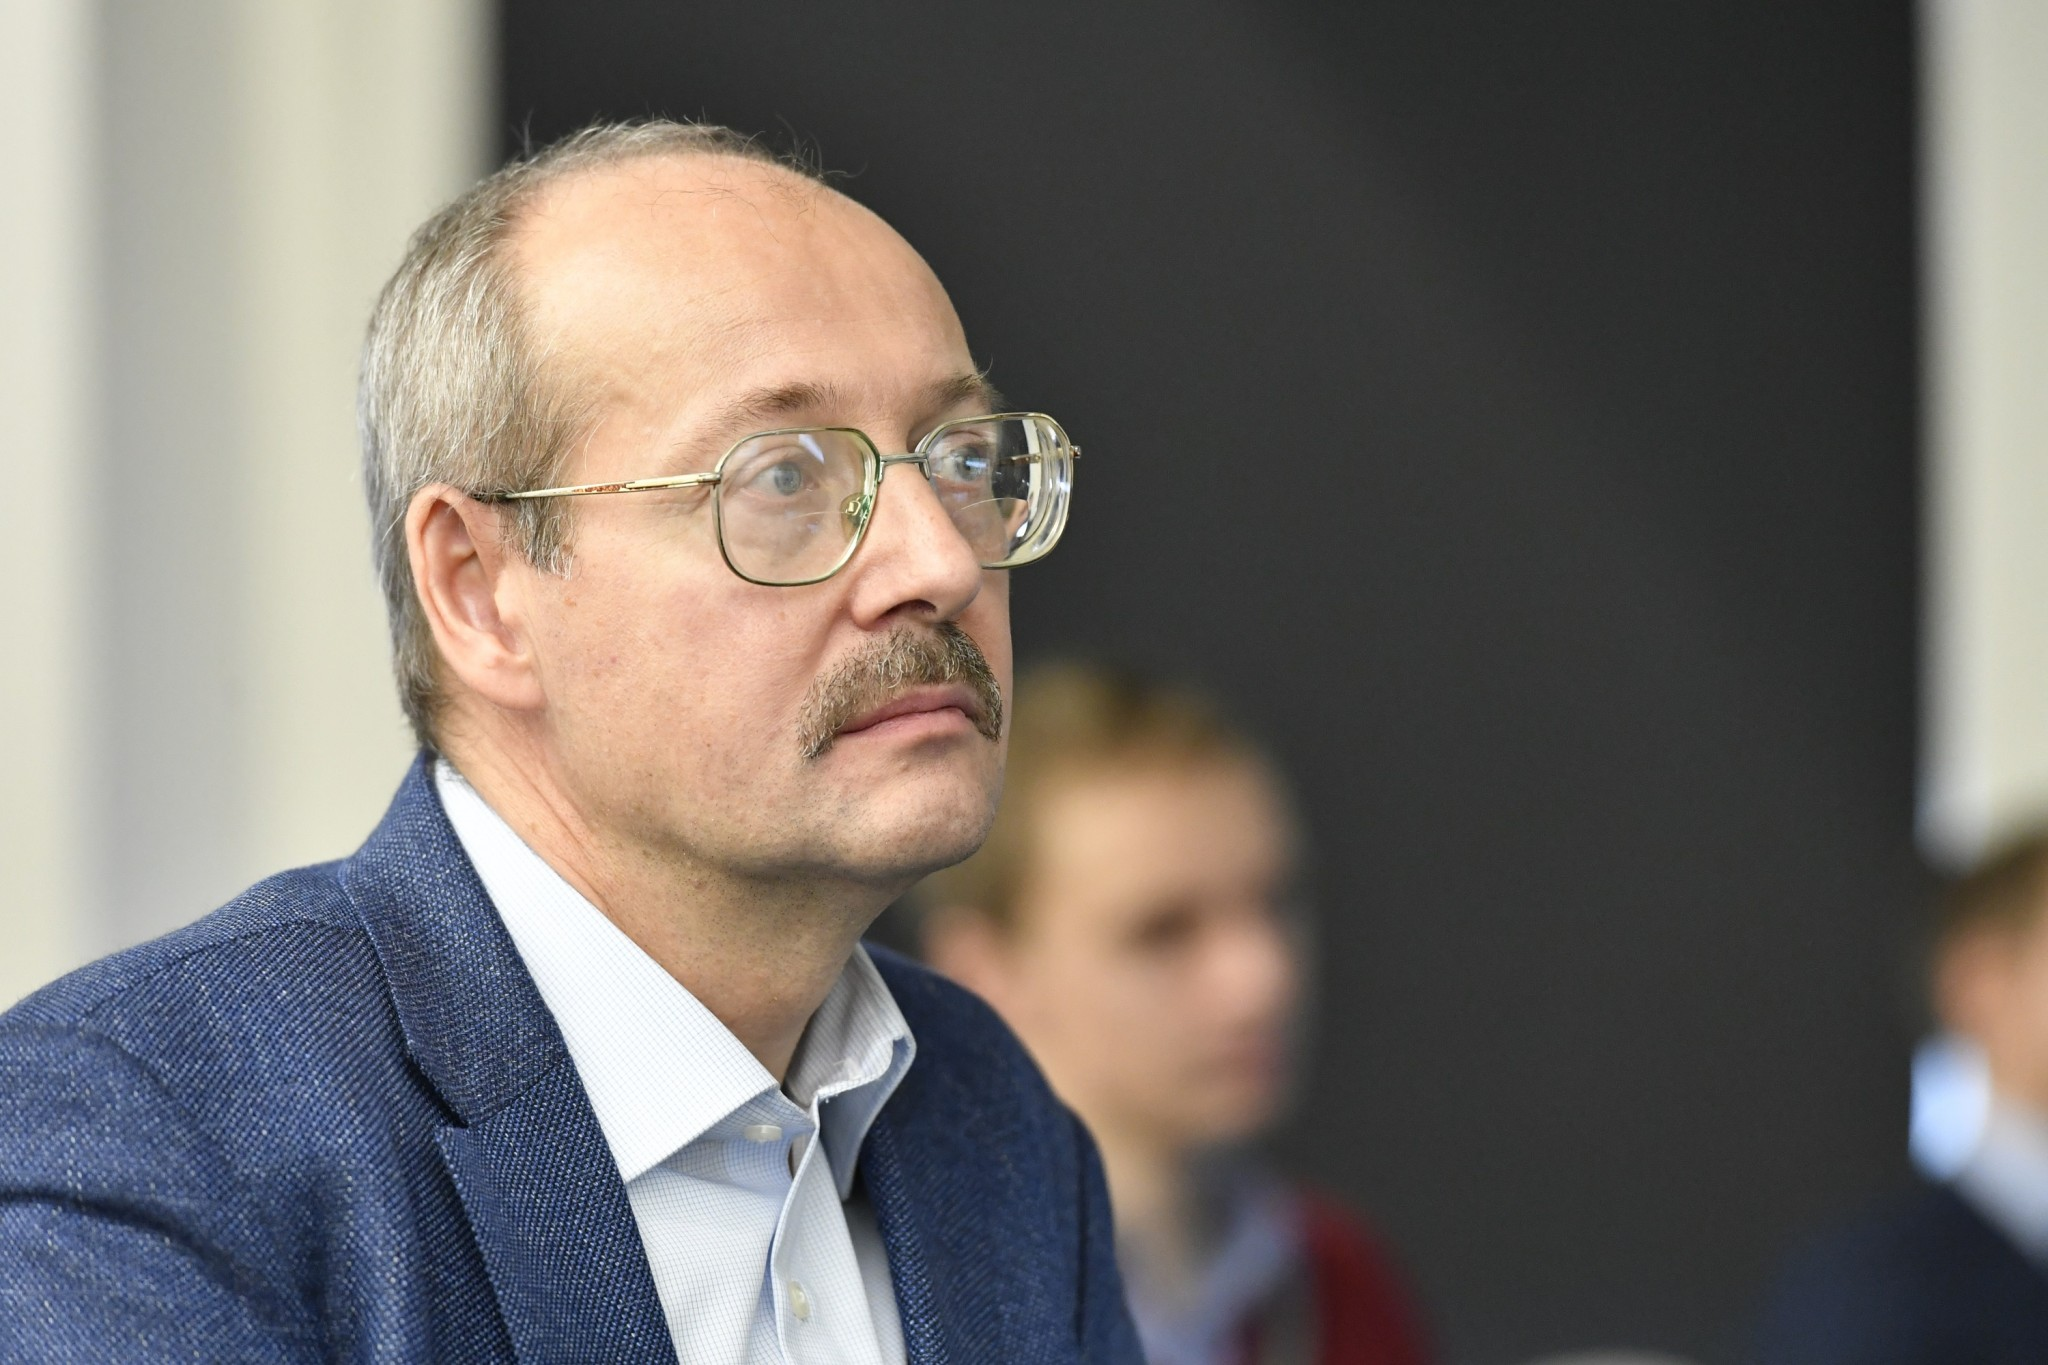 Skoltech Professor Alexey Nikolaev listening to a presentation. Photo: Skoltech.